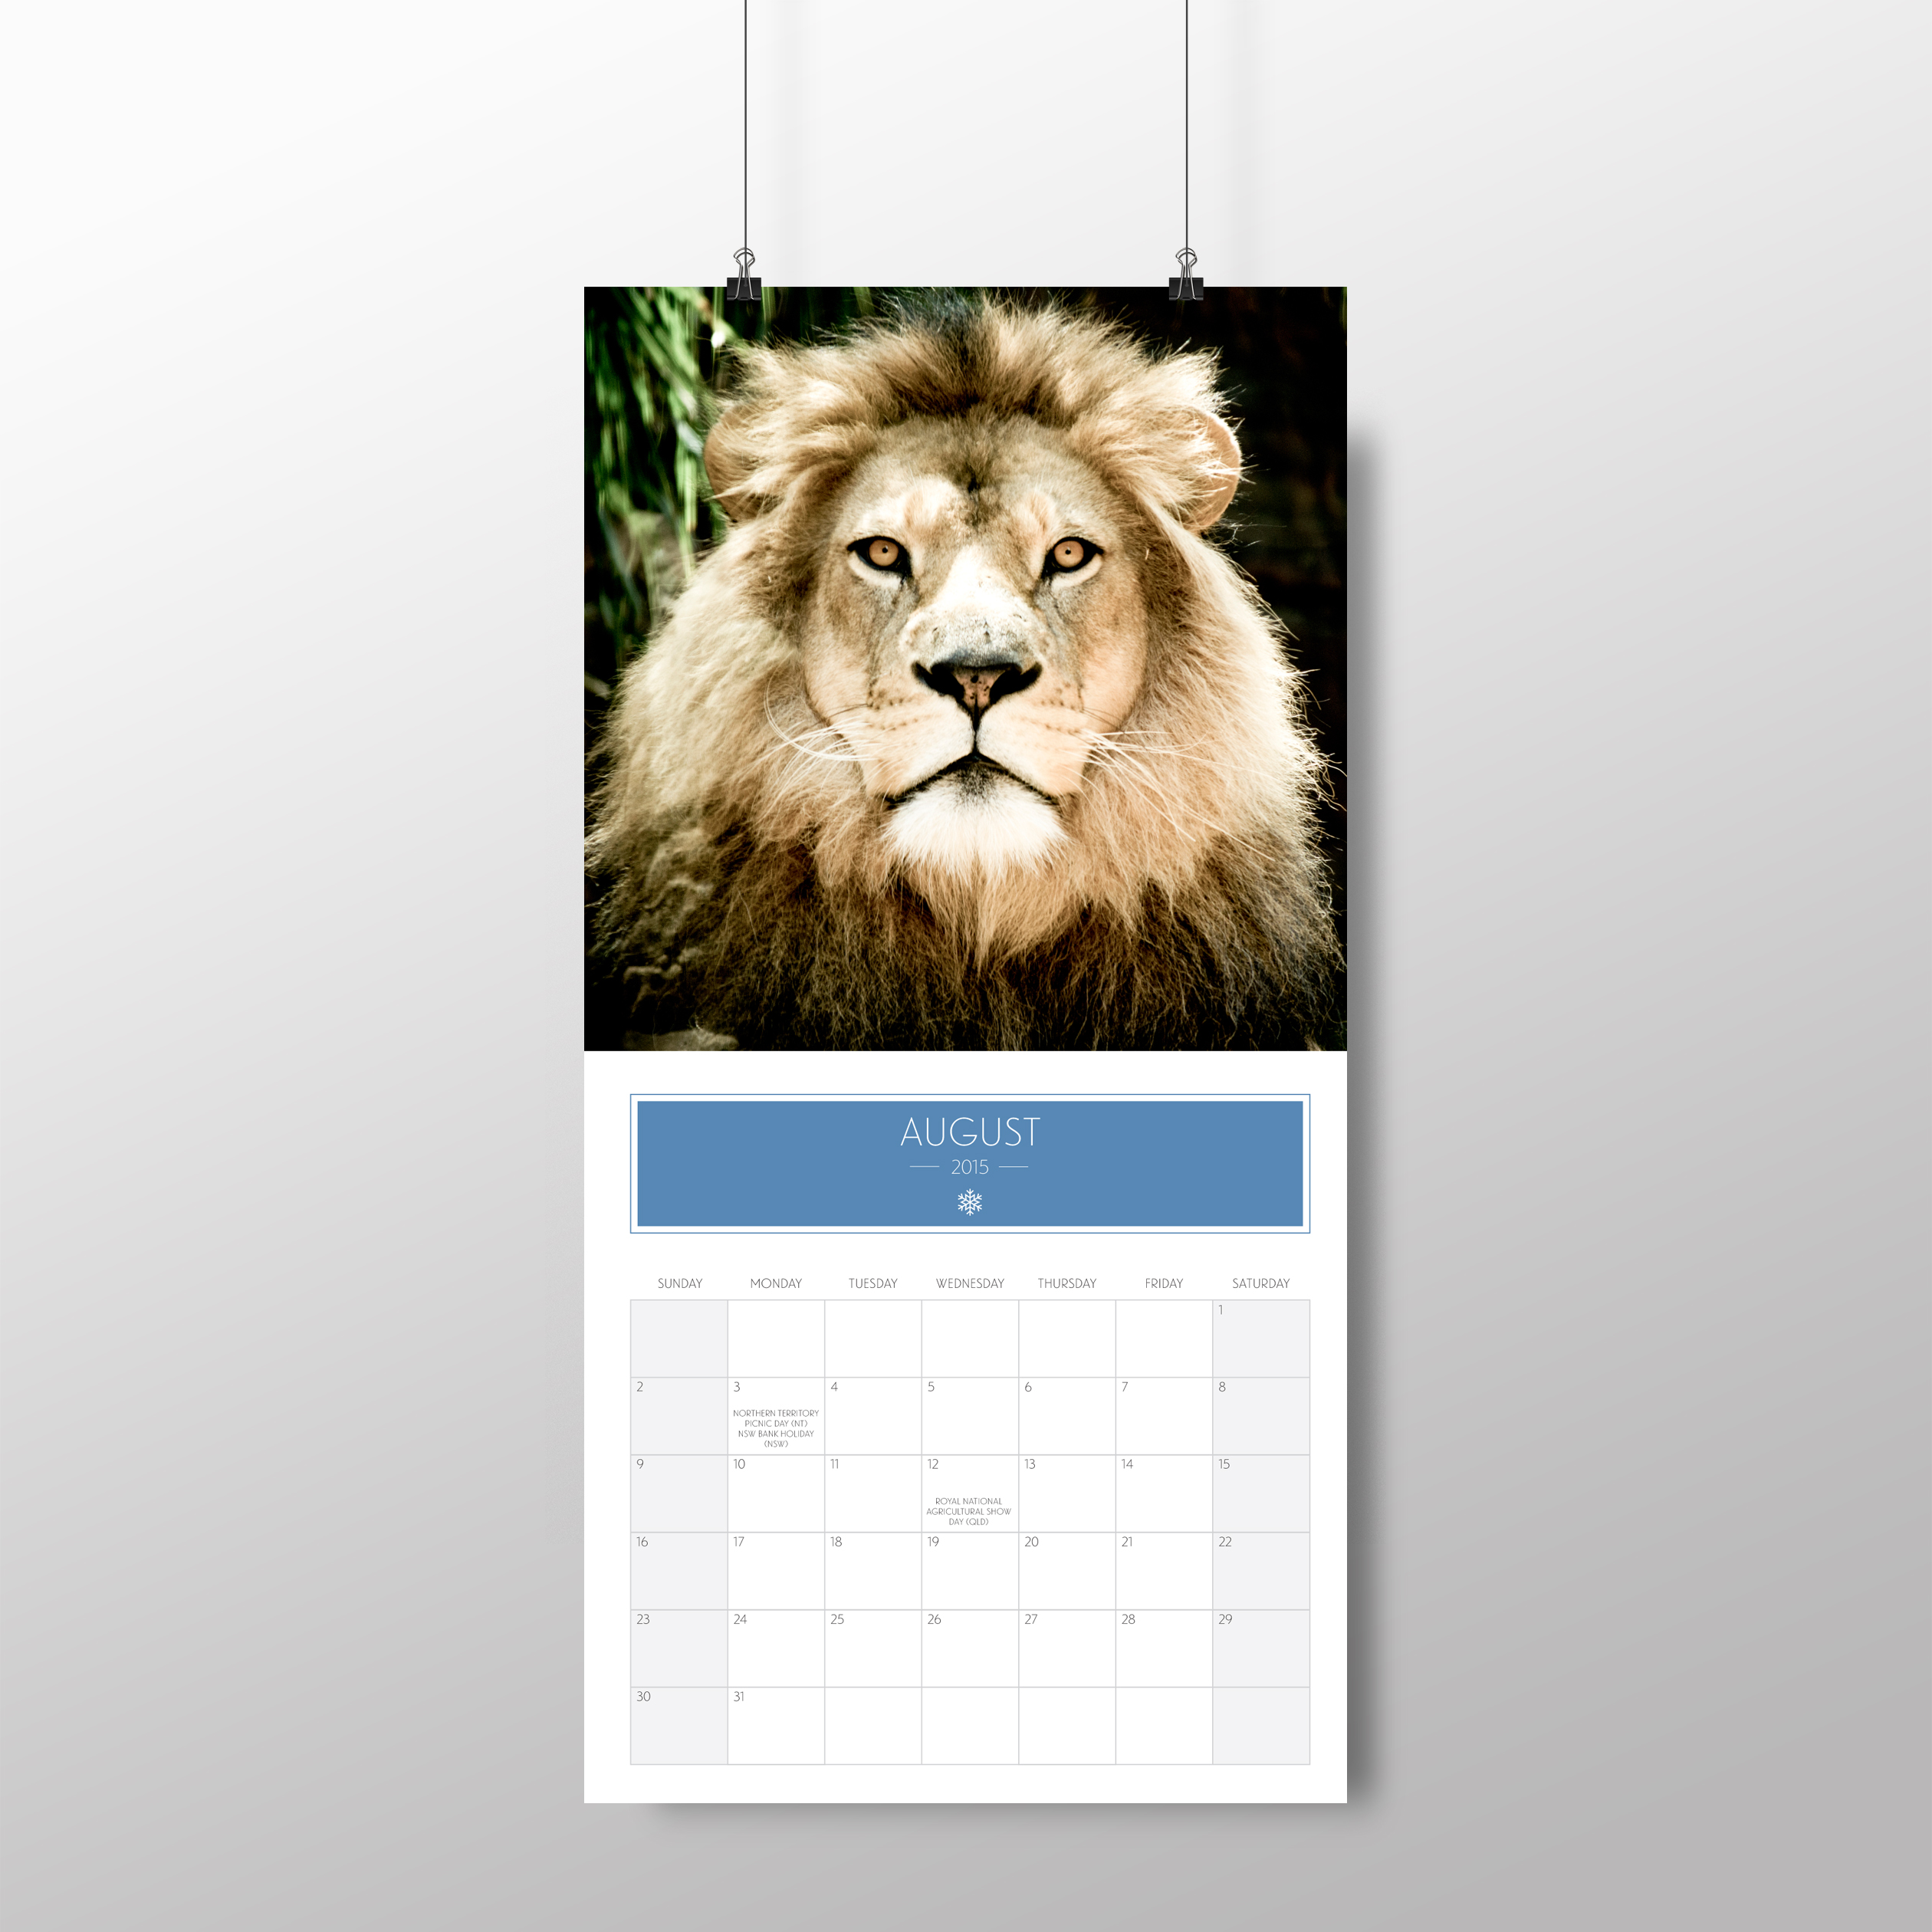 Animal calendar – August